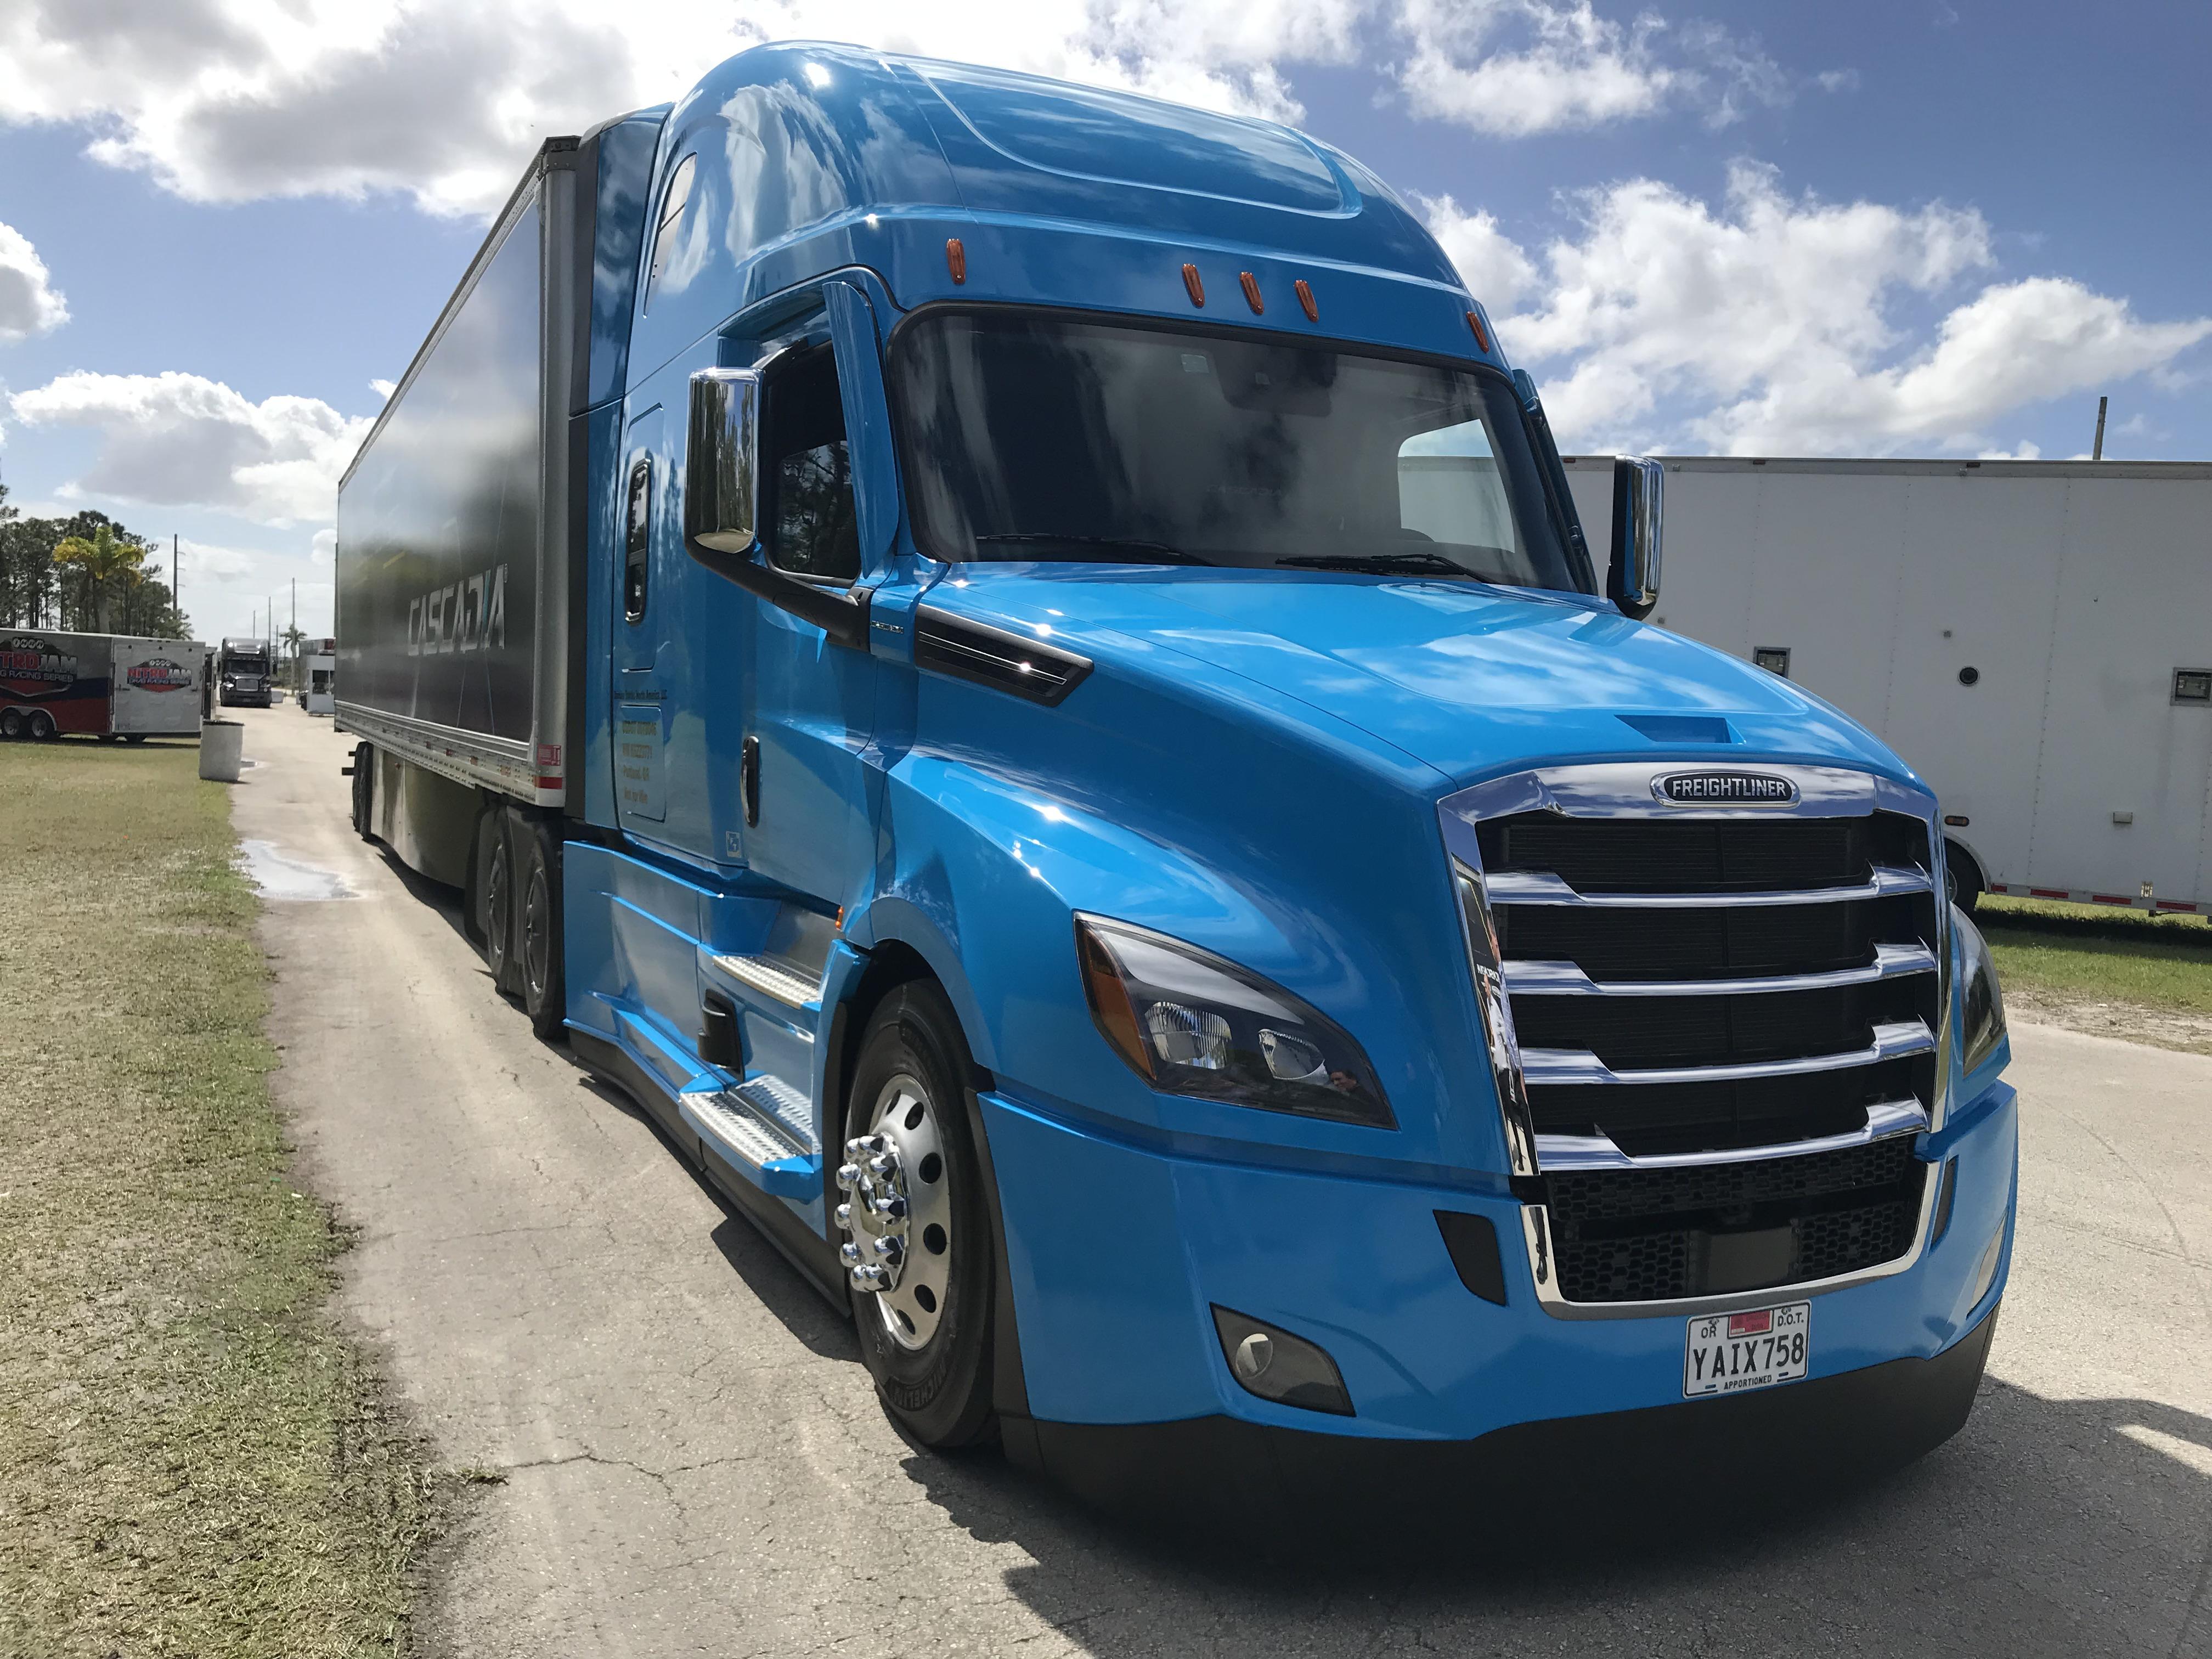 2020 Freightliner Cascadia : Meet The First Semi Self ... |Frieghtliner Cascadia 2020 Sports Car